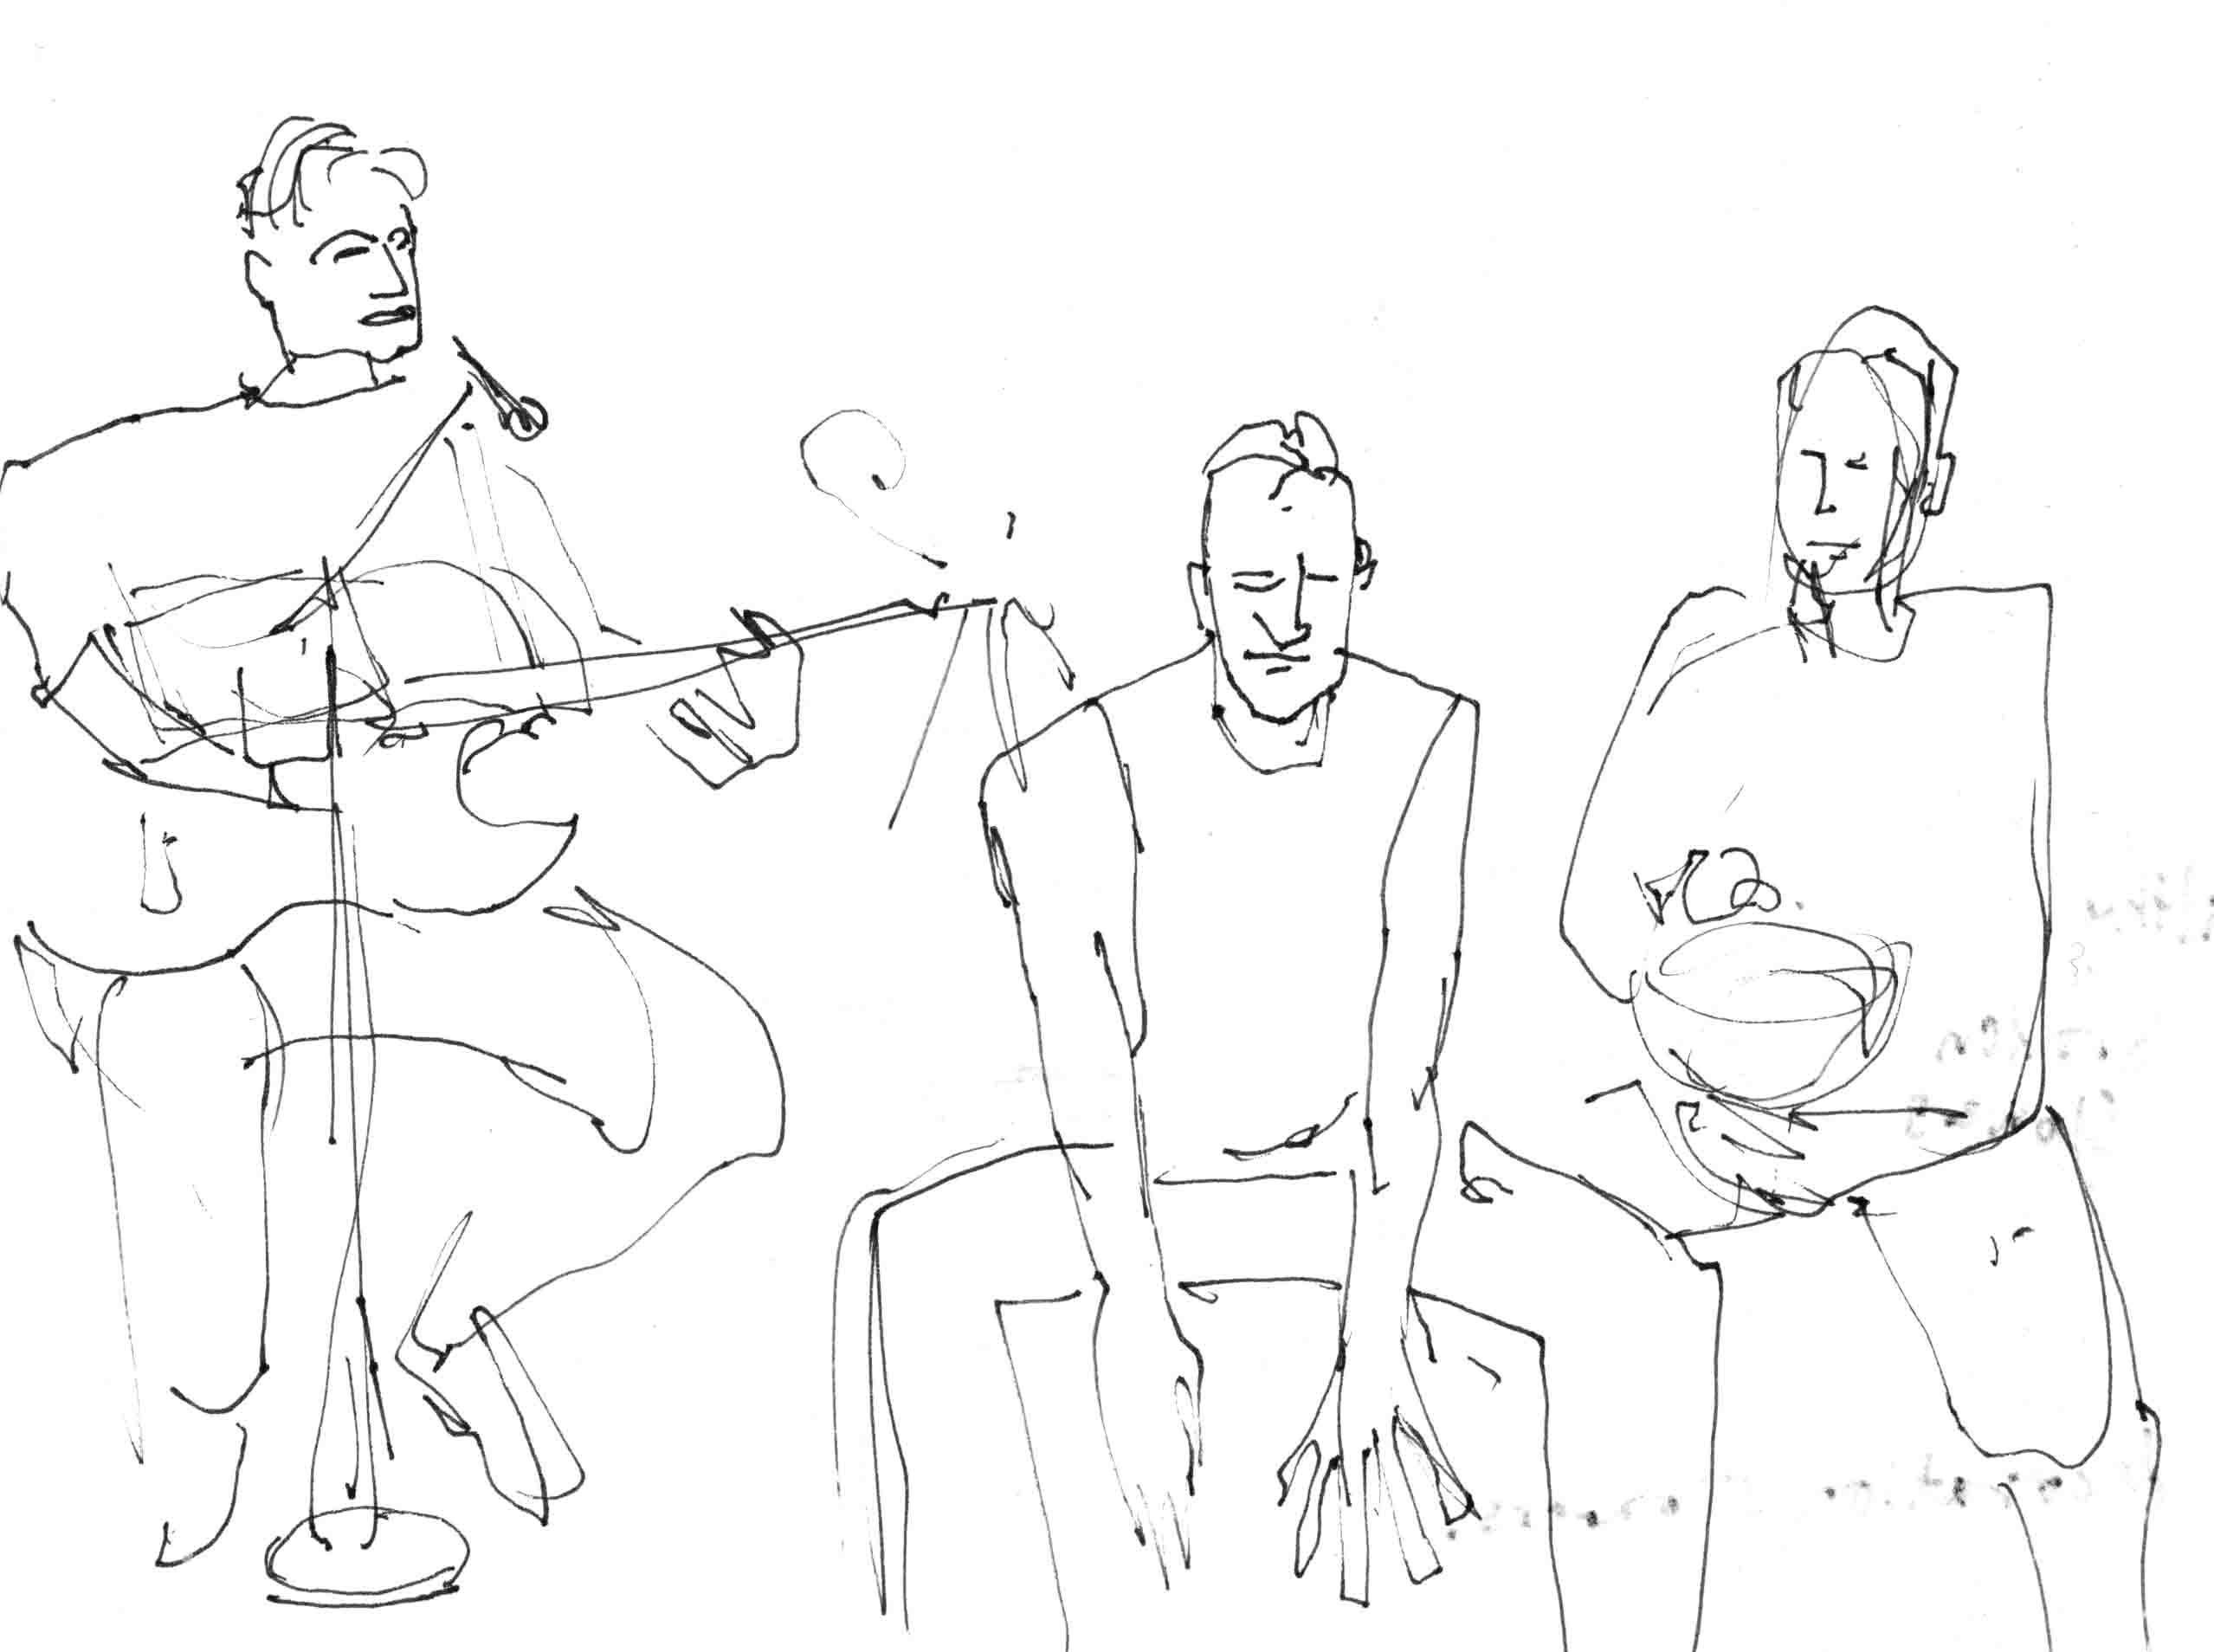 trio kajun gitar og bolle